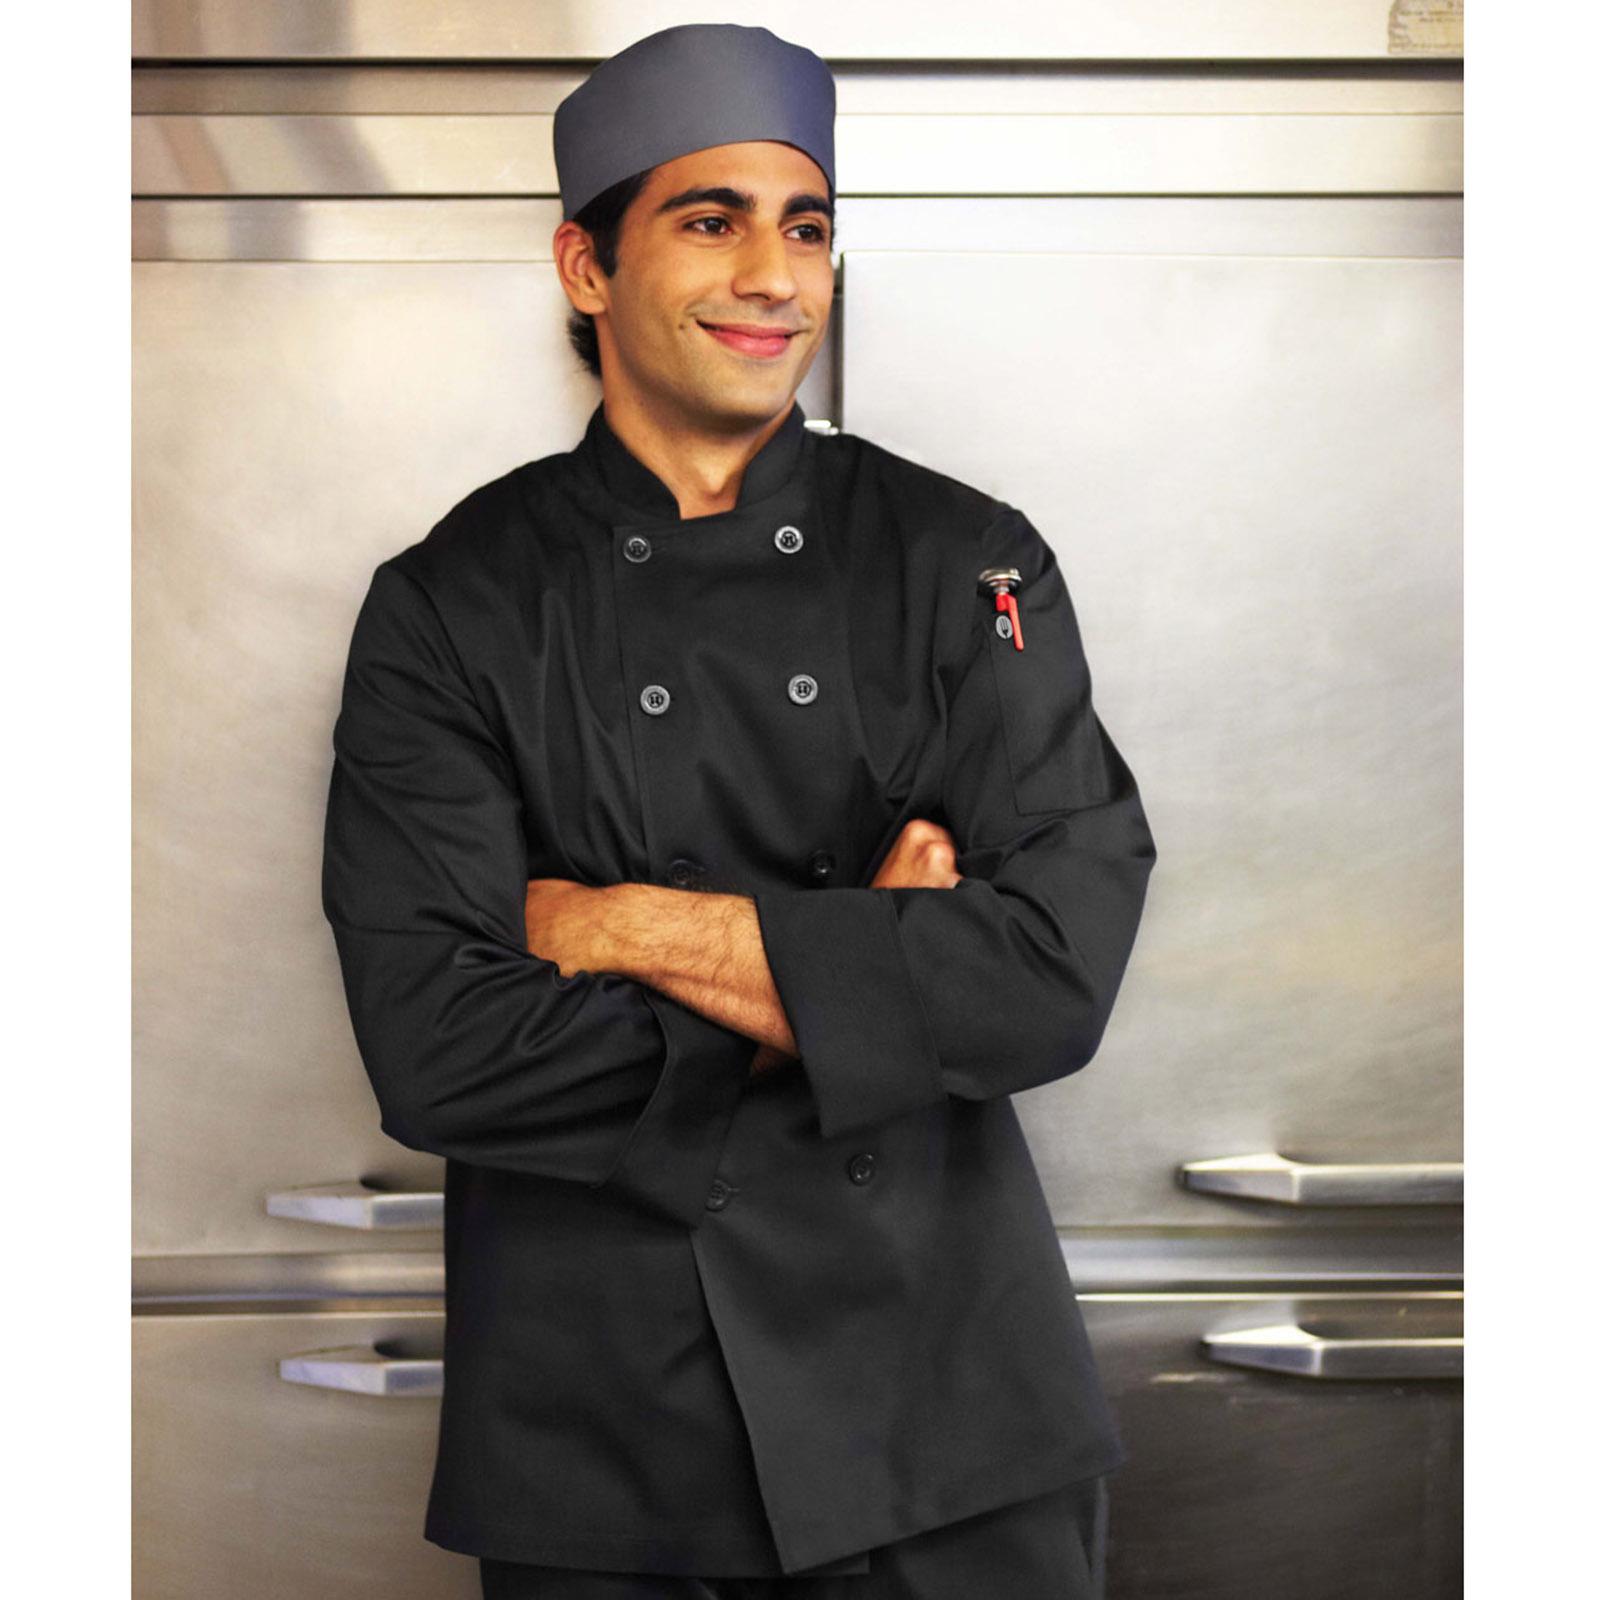 BASTBLKM Chef Works chef's coat